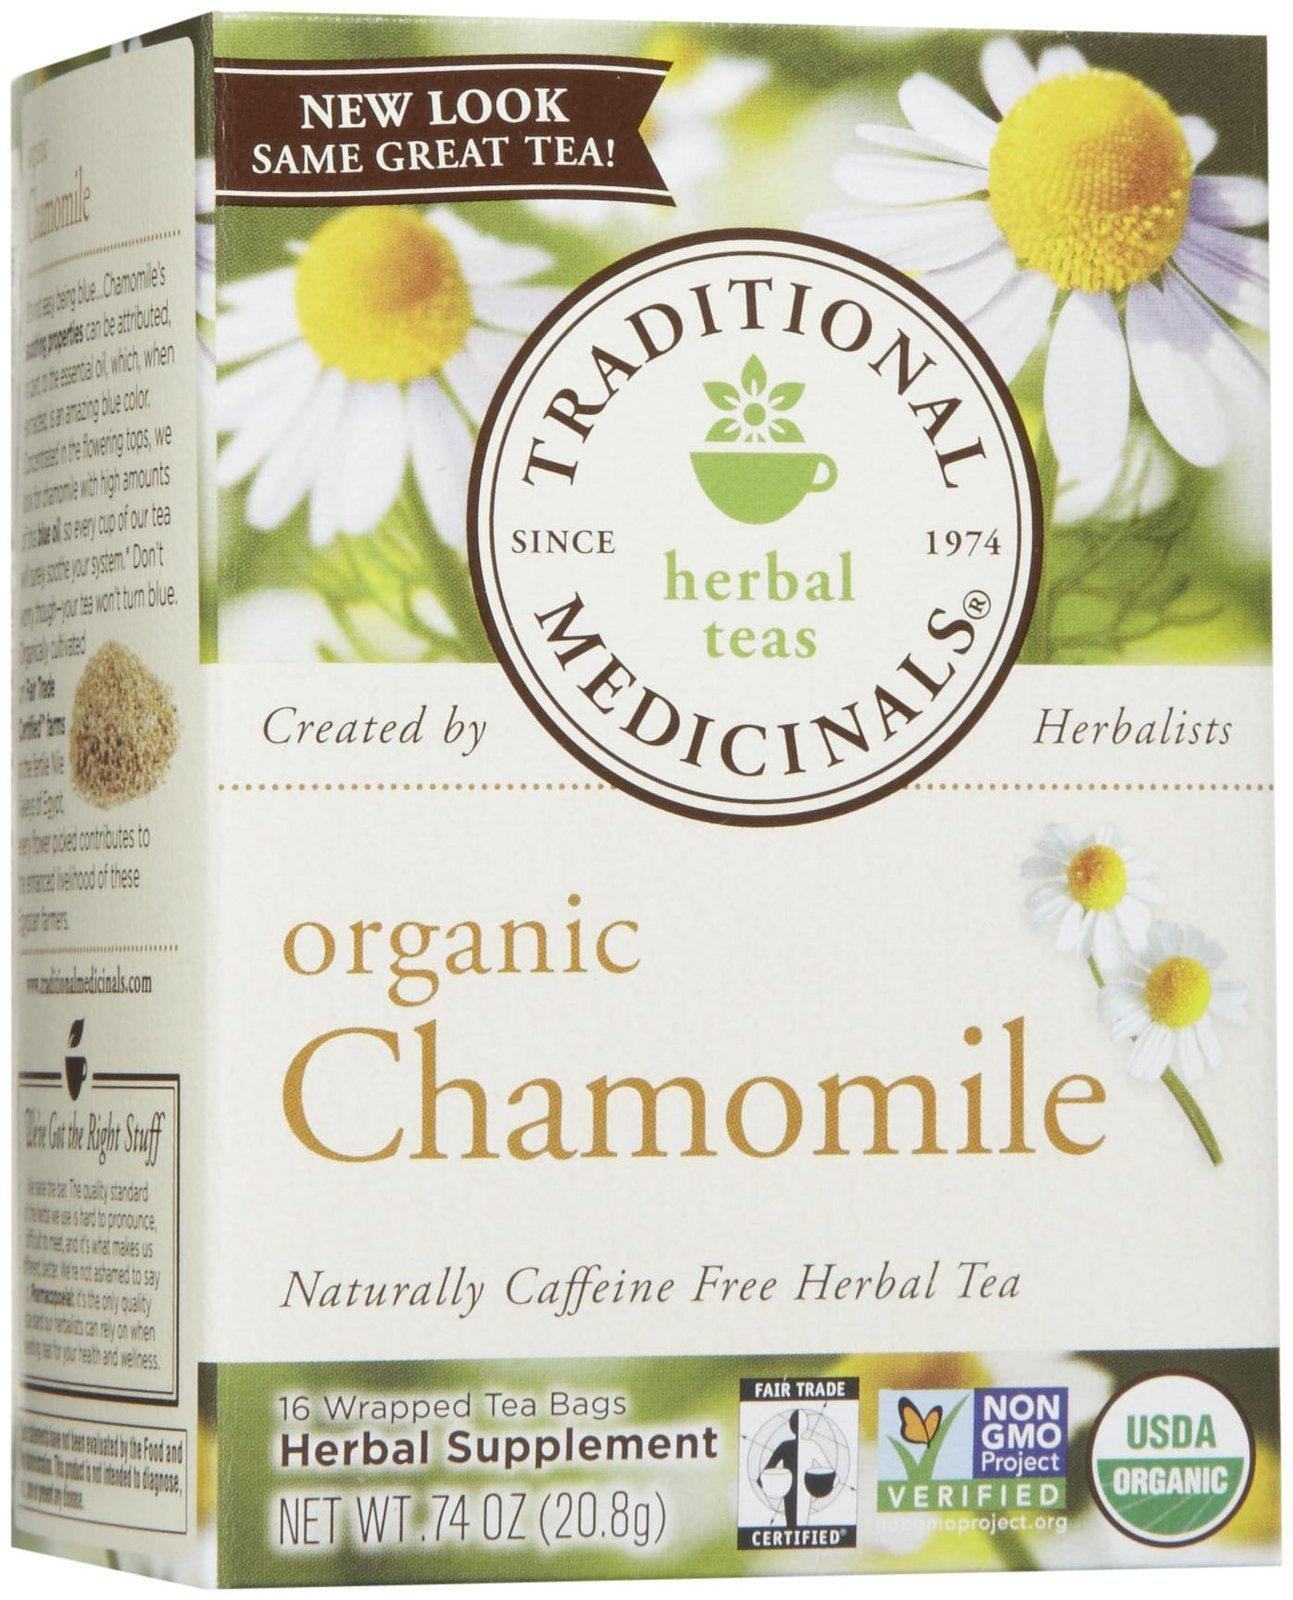 Traditional Medicinals Organic Chamomile Herbal Tea